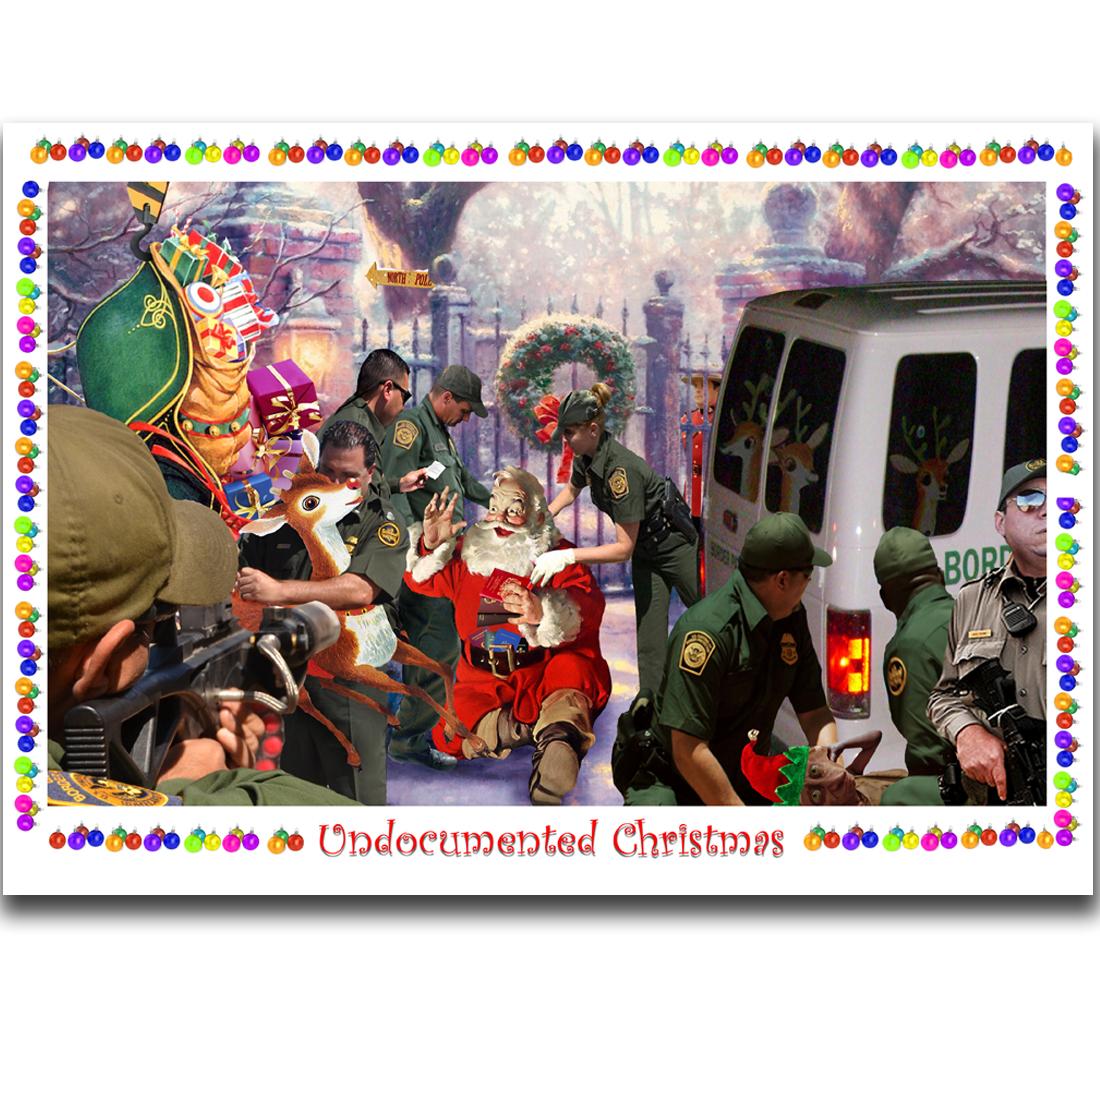 C476 Undocumented Christmas